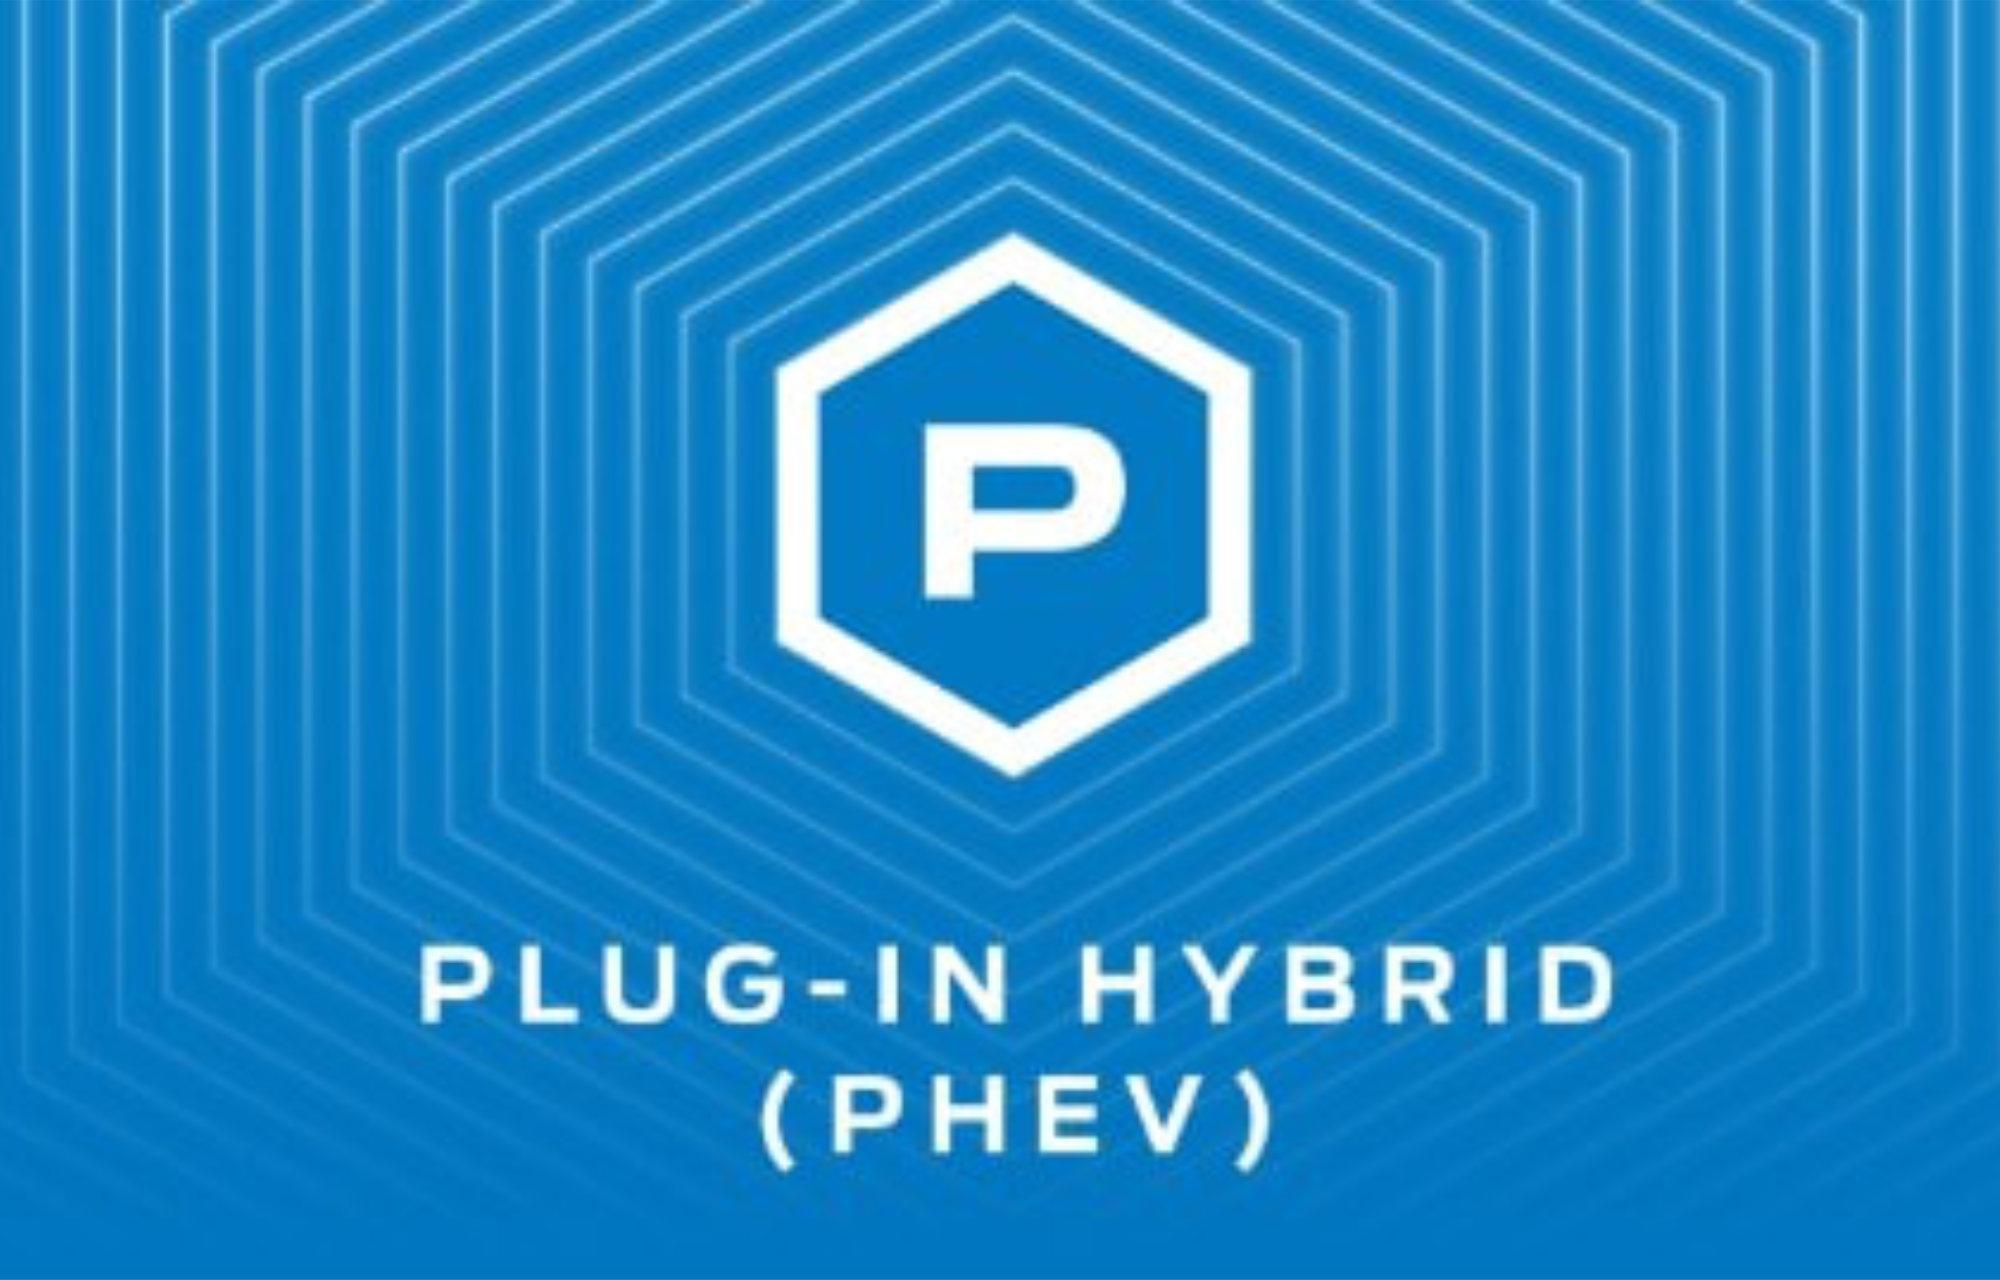 Plug-In Hybrid (PHEV)